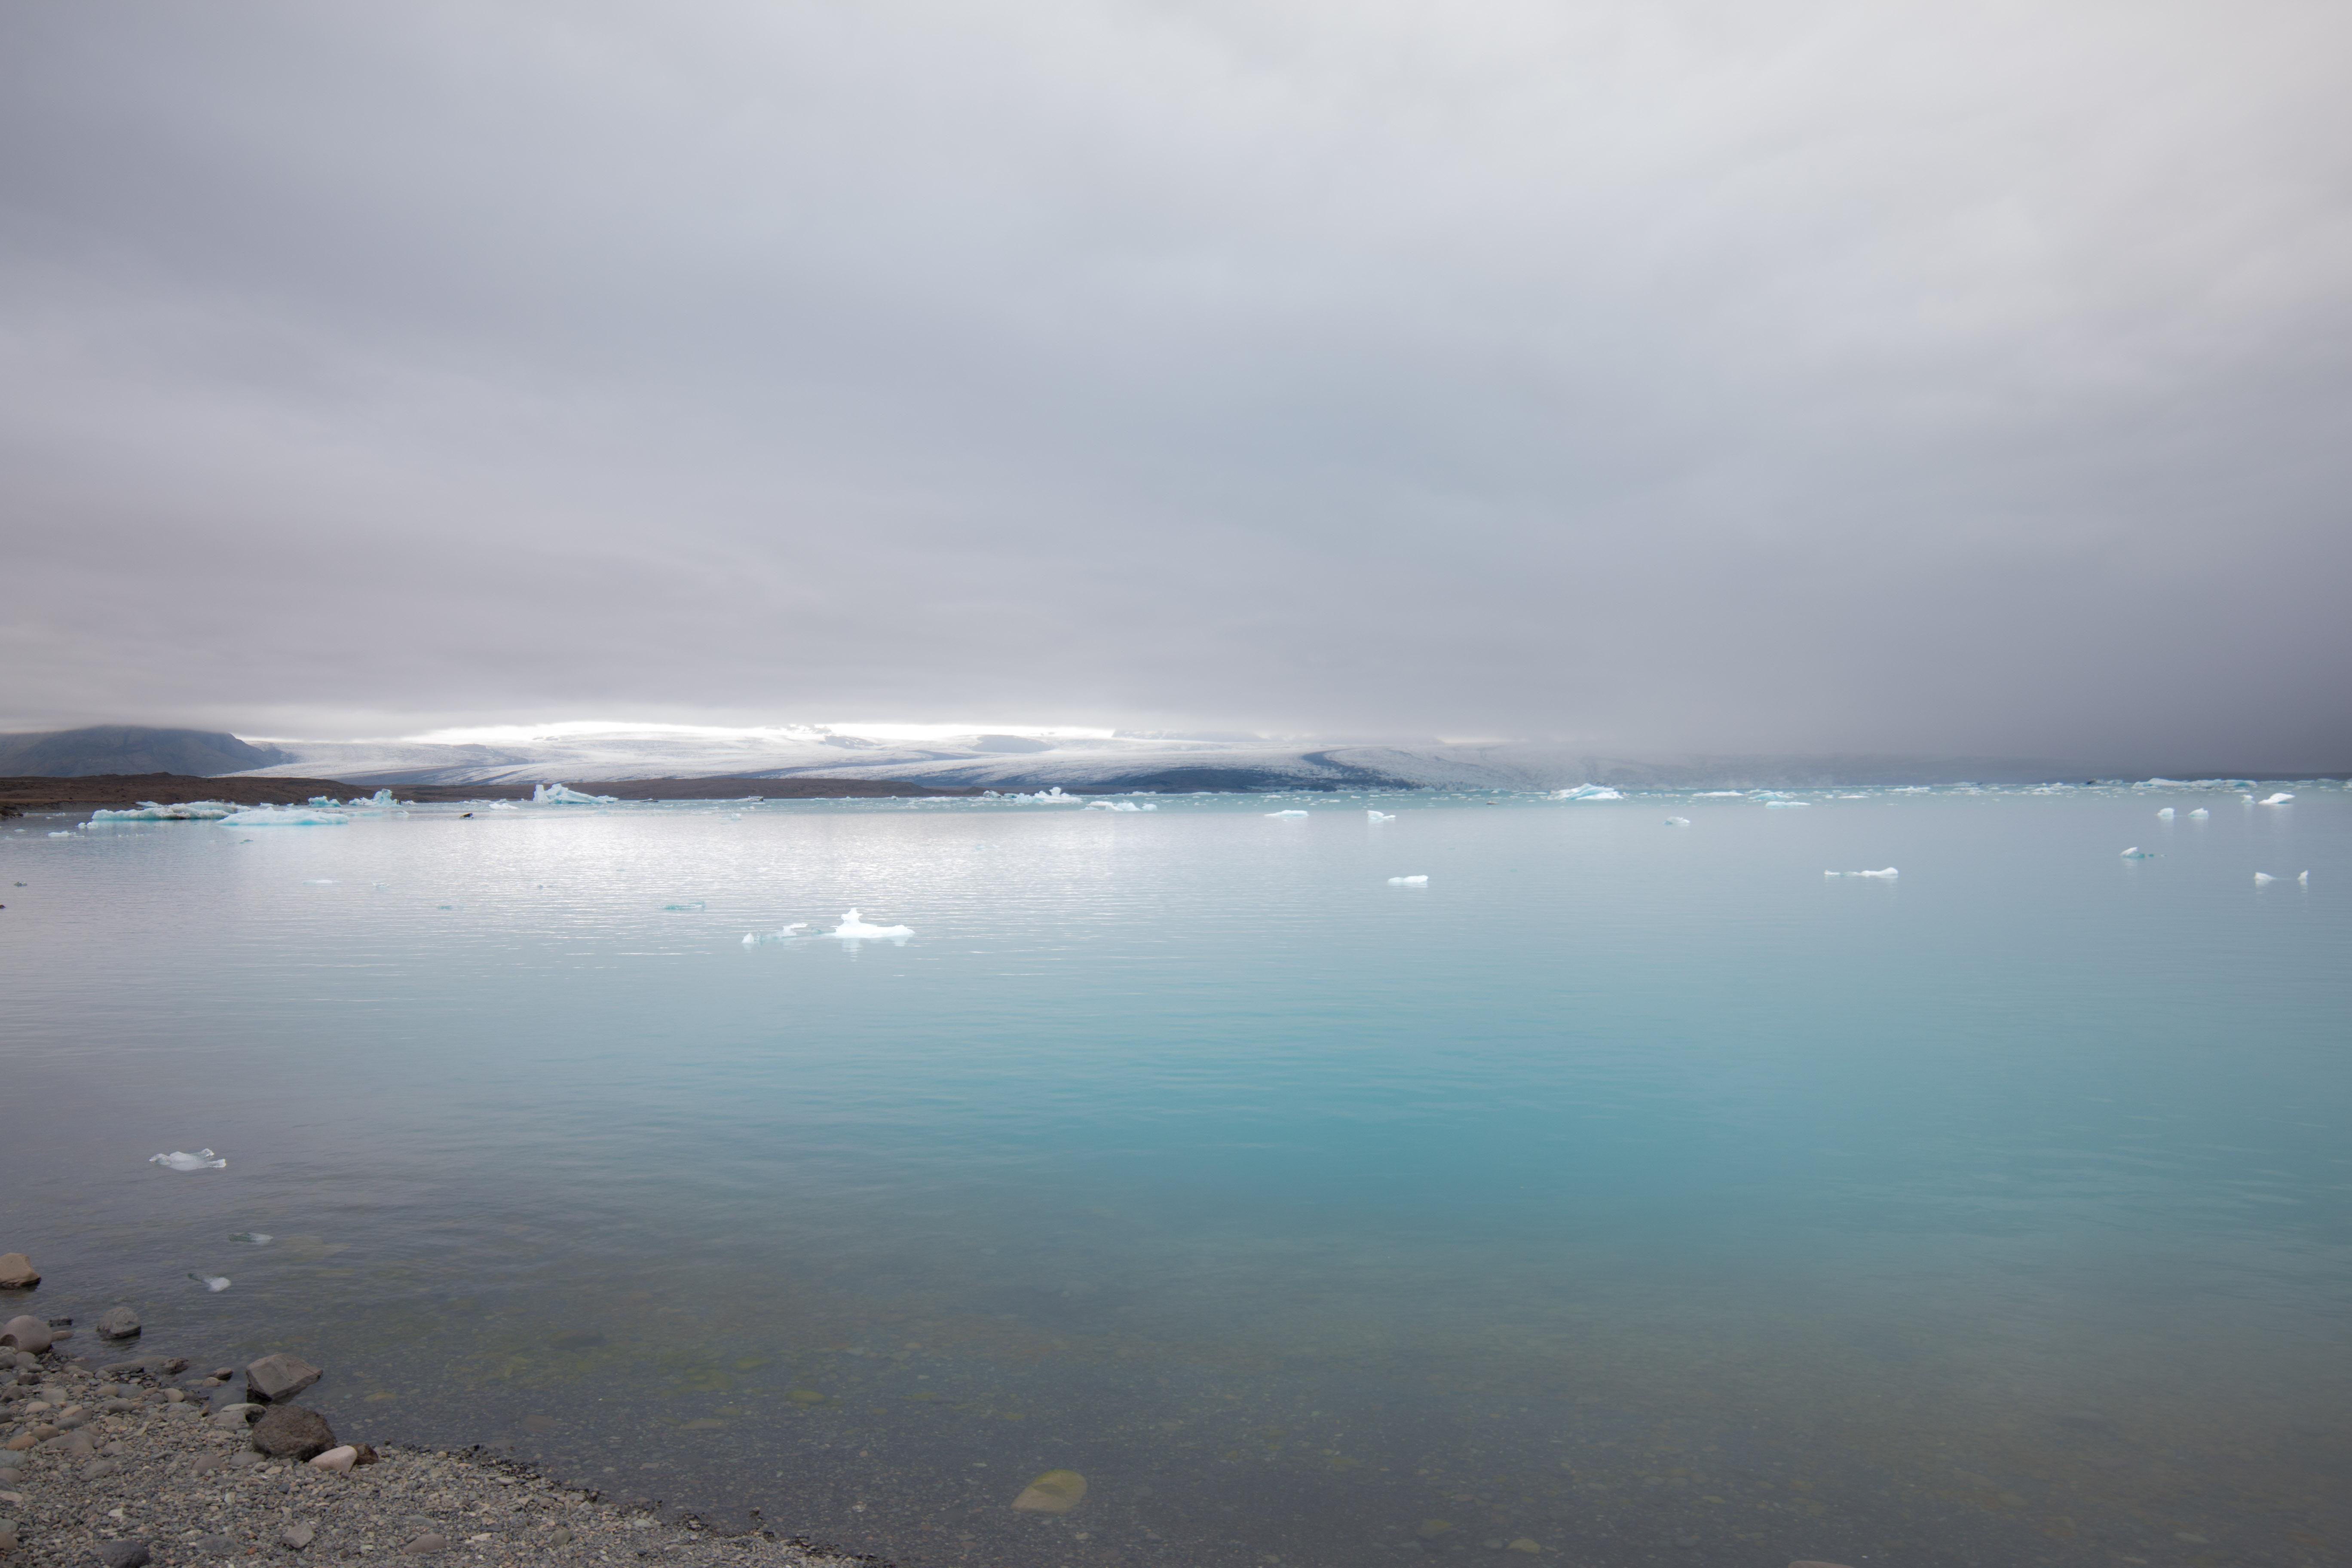 voyage en islande pendant 8 jours avec ma maman I Sp4nkblog_-26